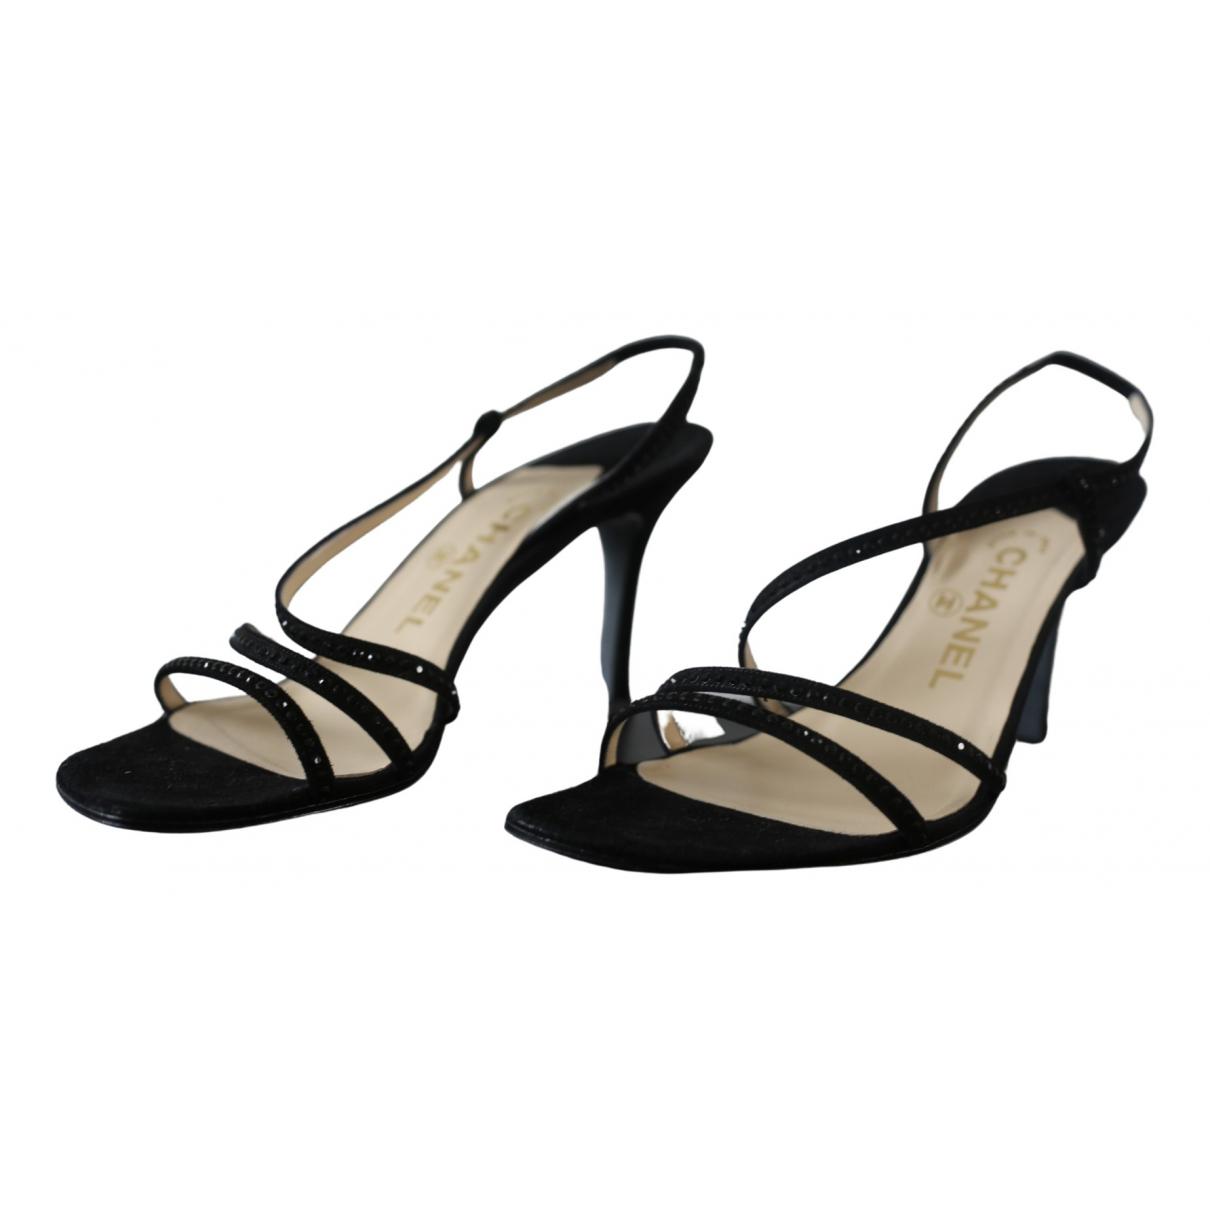 Chanel \N Black Leather Sandals for Women 38.5 EU